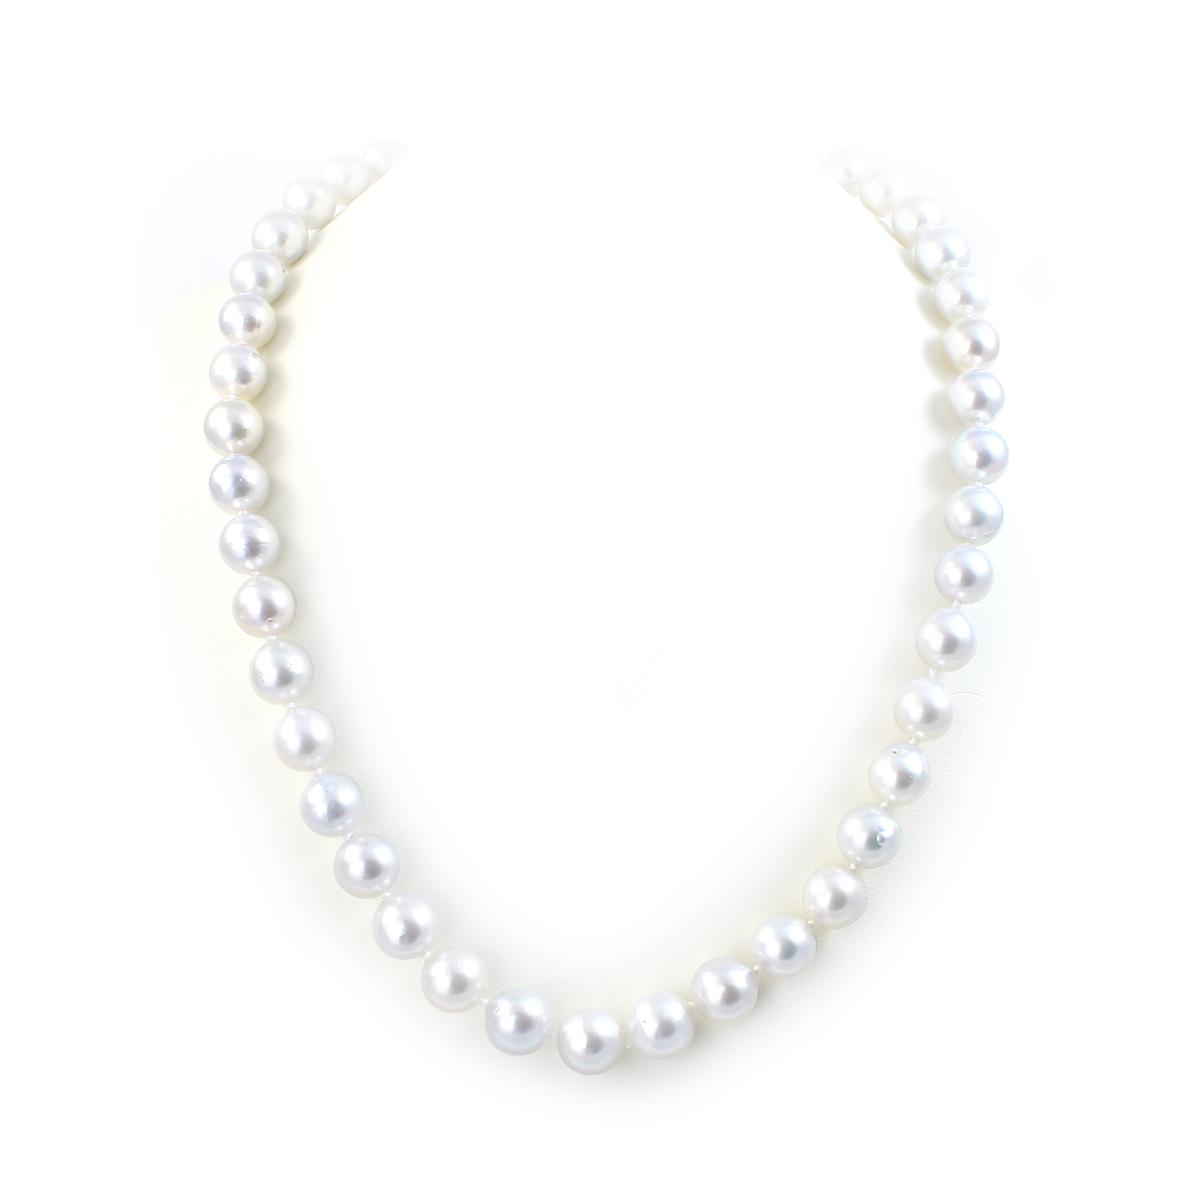 14 Karat White Gold 8.5-10mm White South Sea Pearl Necklace